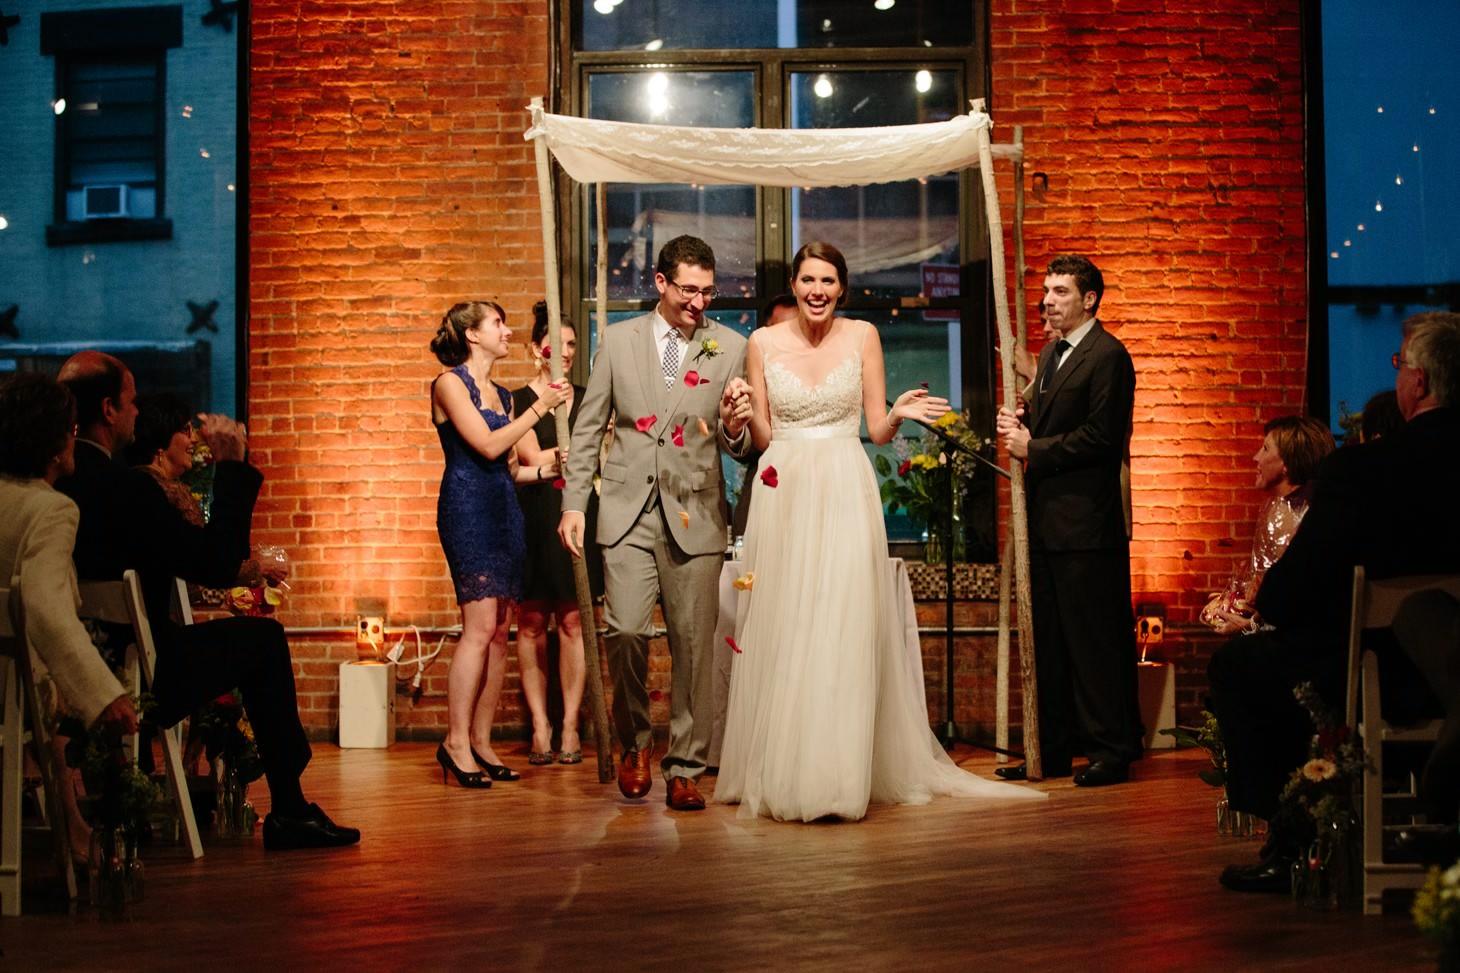 031-nyc-dumbo-loft-brooklyn-wedding-photographer-smitten-chickens-photo-.jpg